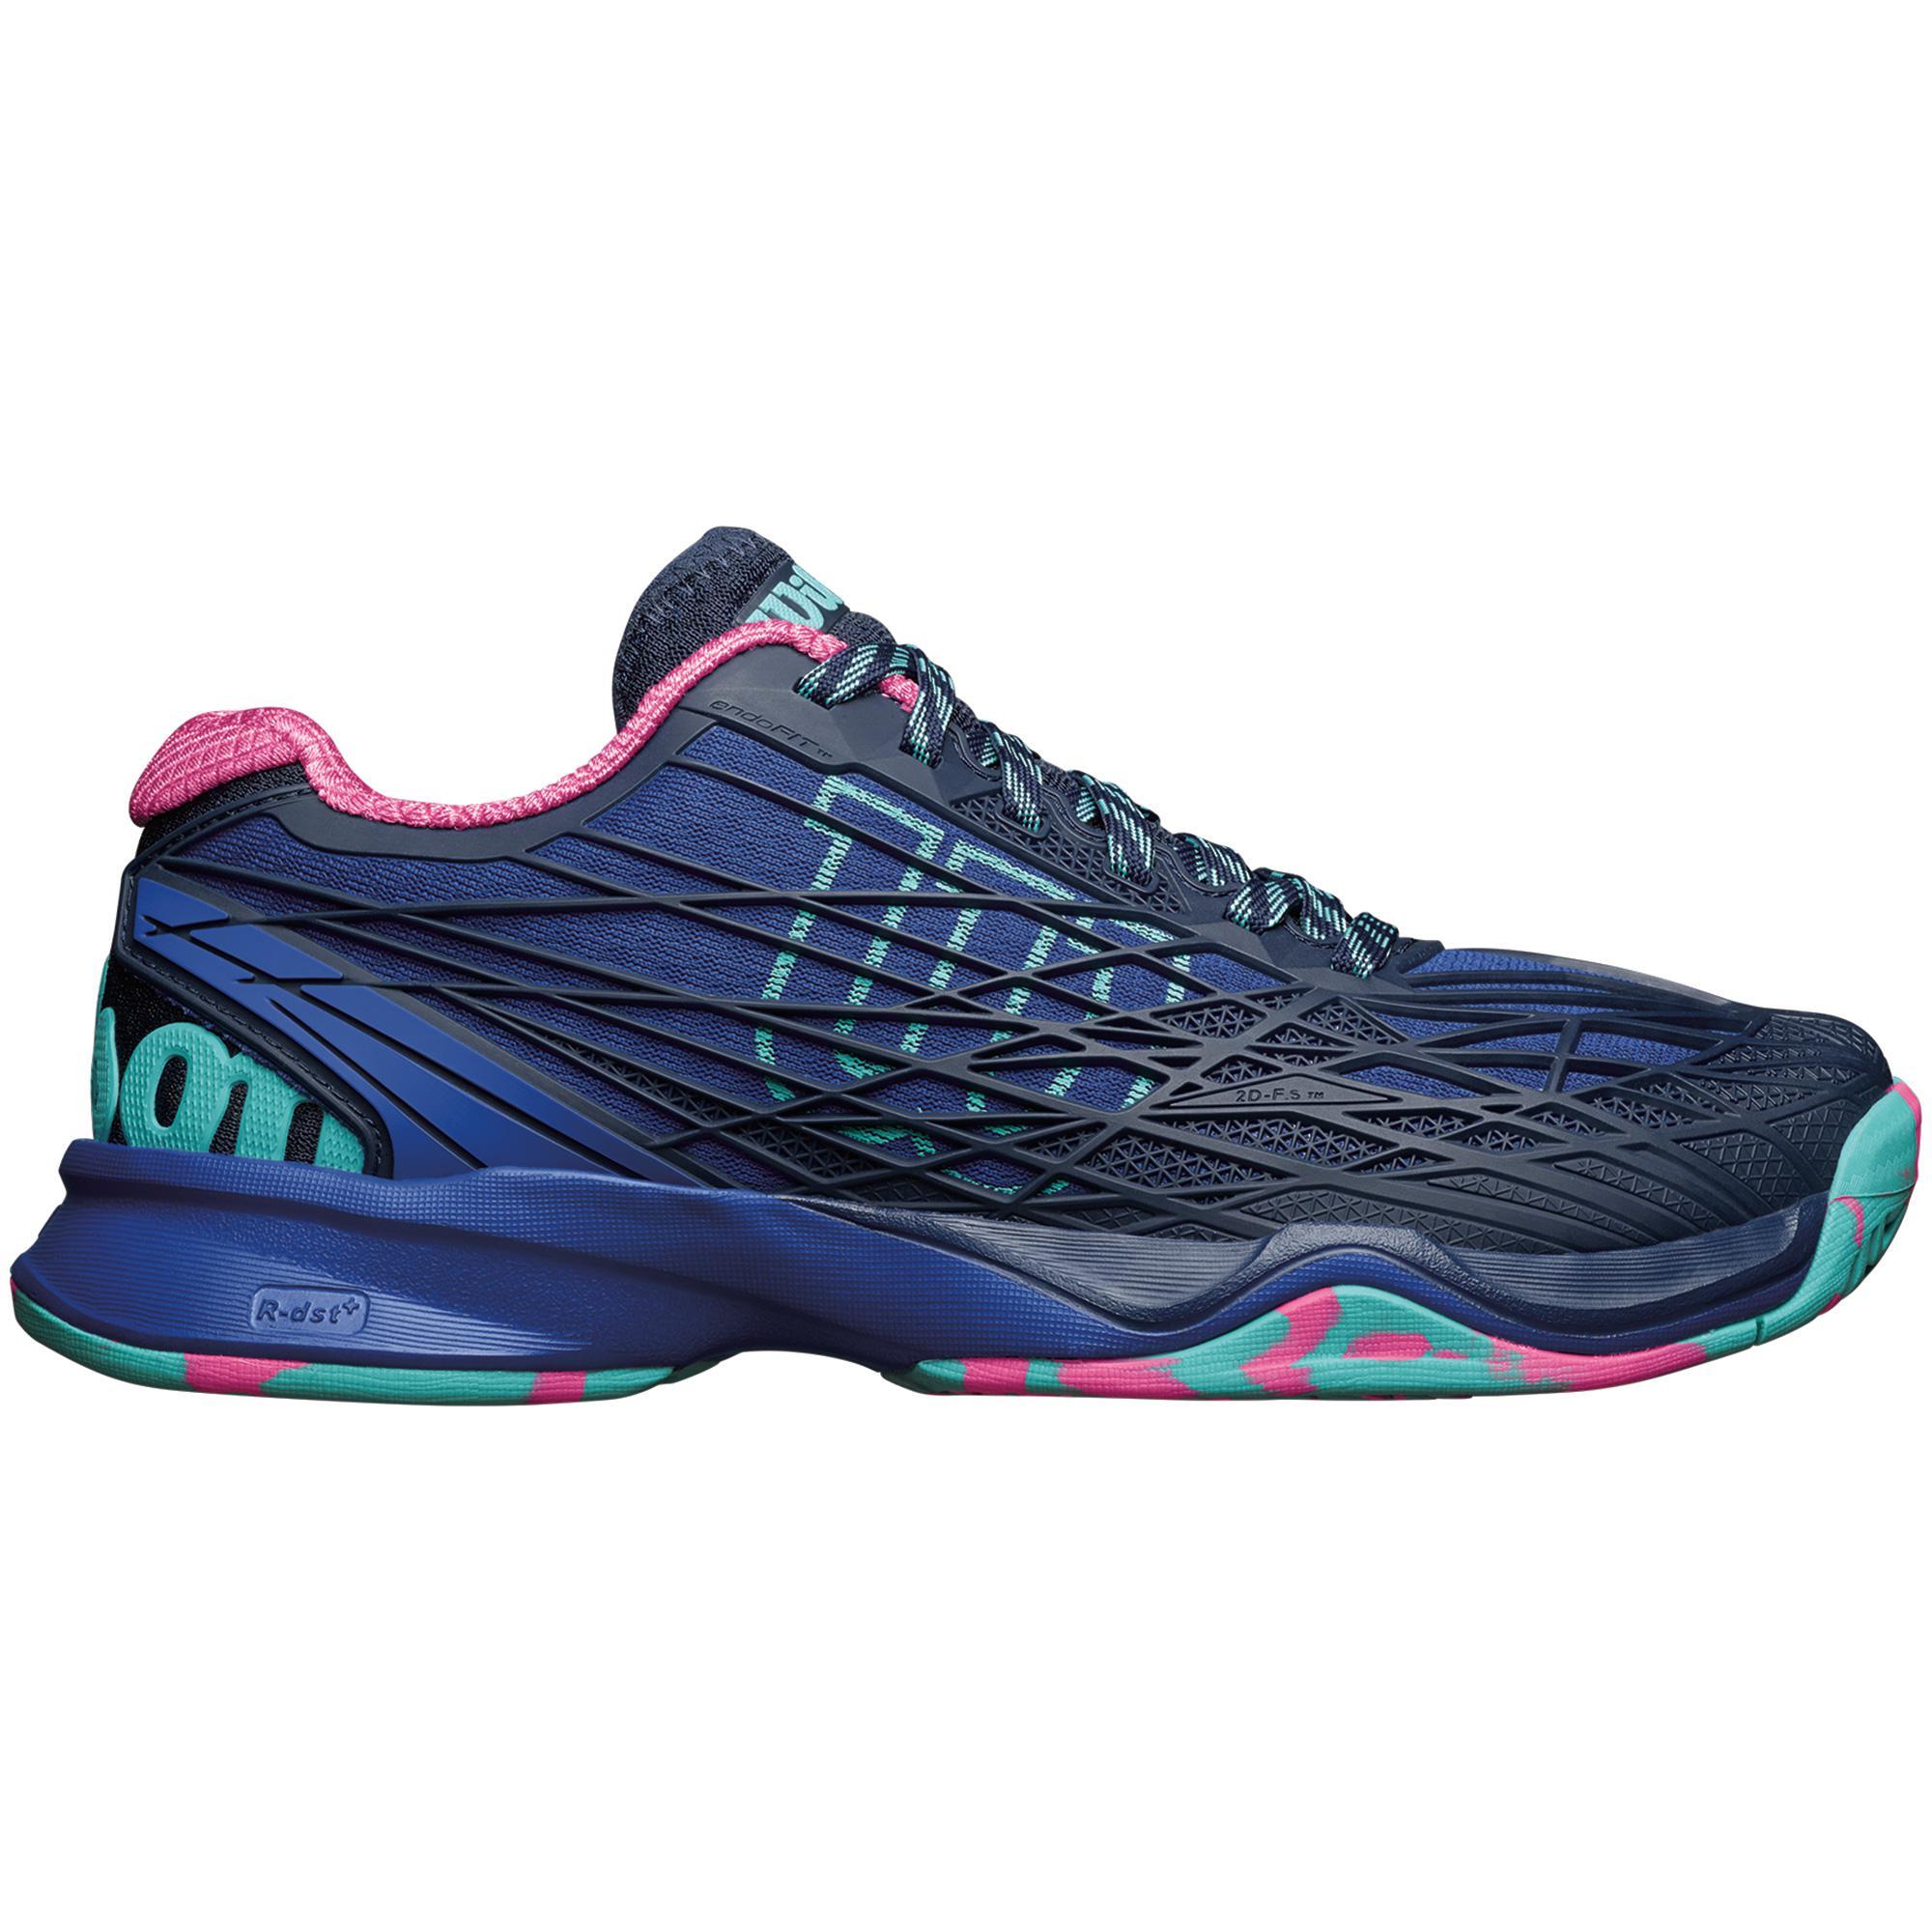 new style b7474 f599e Wilson Womens Kaos Tennis Shoes - Blue - Tennisnuts.com